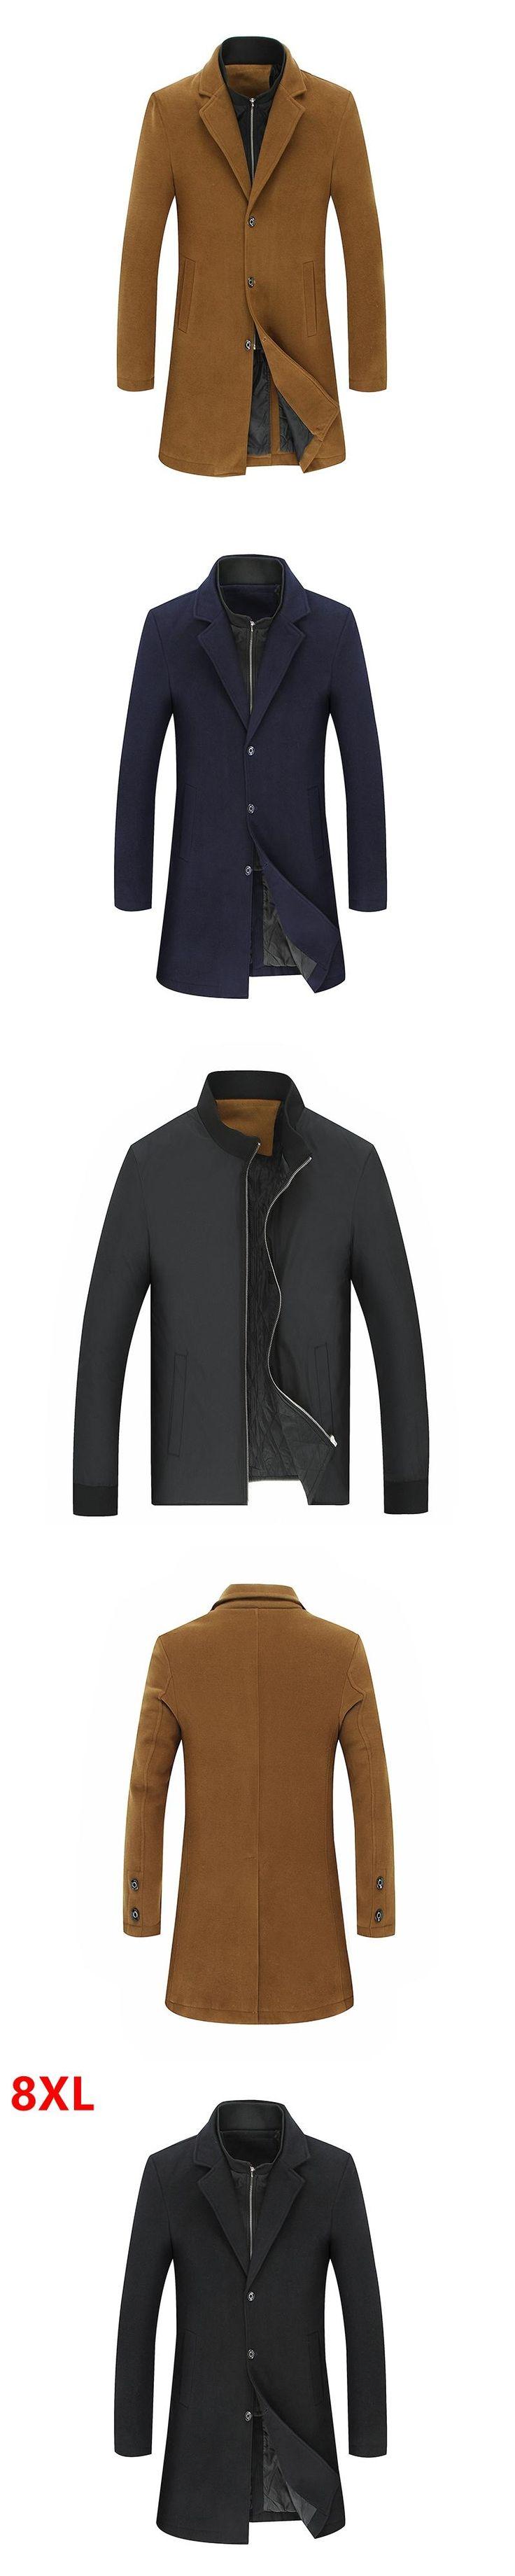 Big size Autumn  winter new section  coat plus  size  windbreaker tall men plus size woolen coat jacket cloak 2 in 1